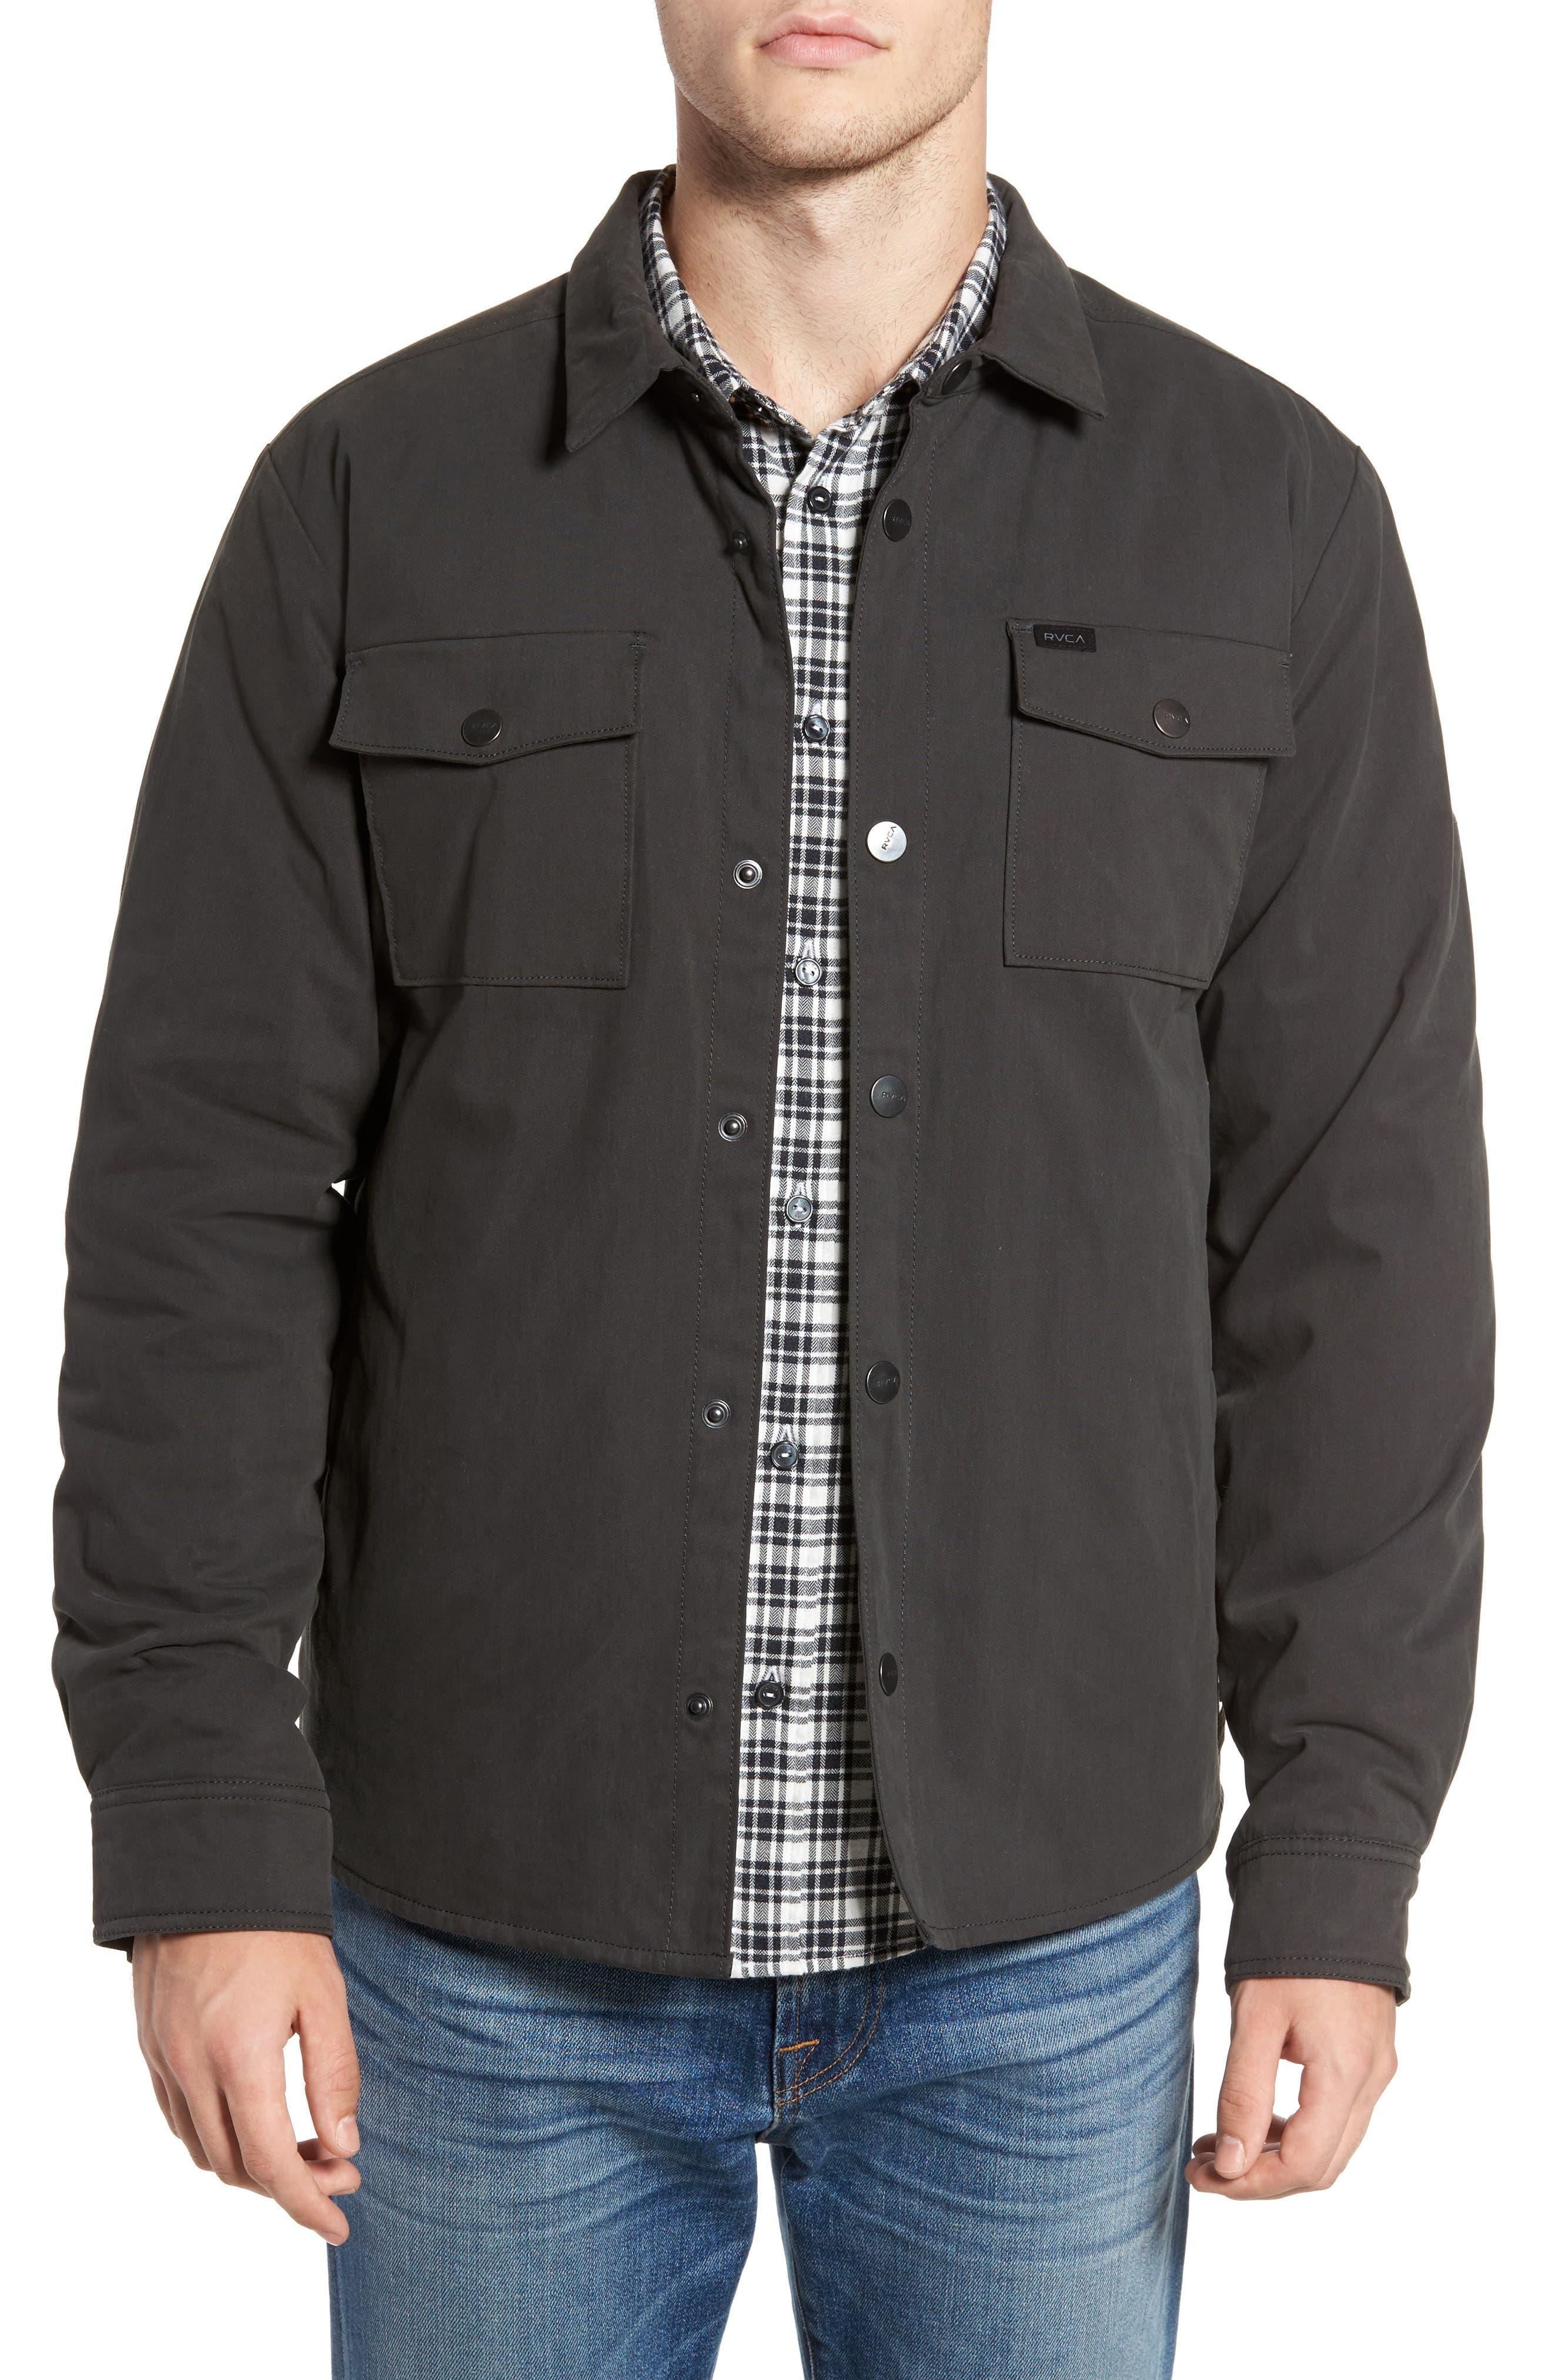 Officer's Shirt Jacket,                             Main thumbnail 1, color,                             Pirate Black